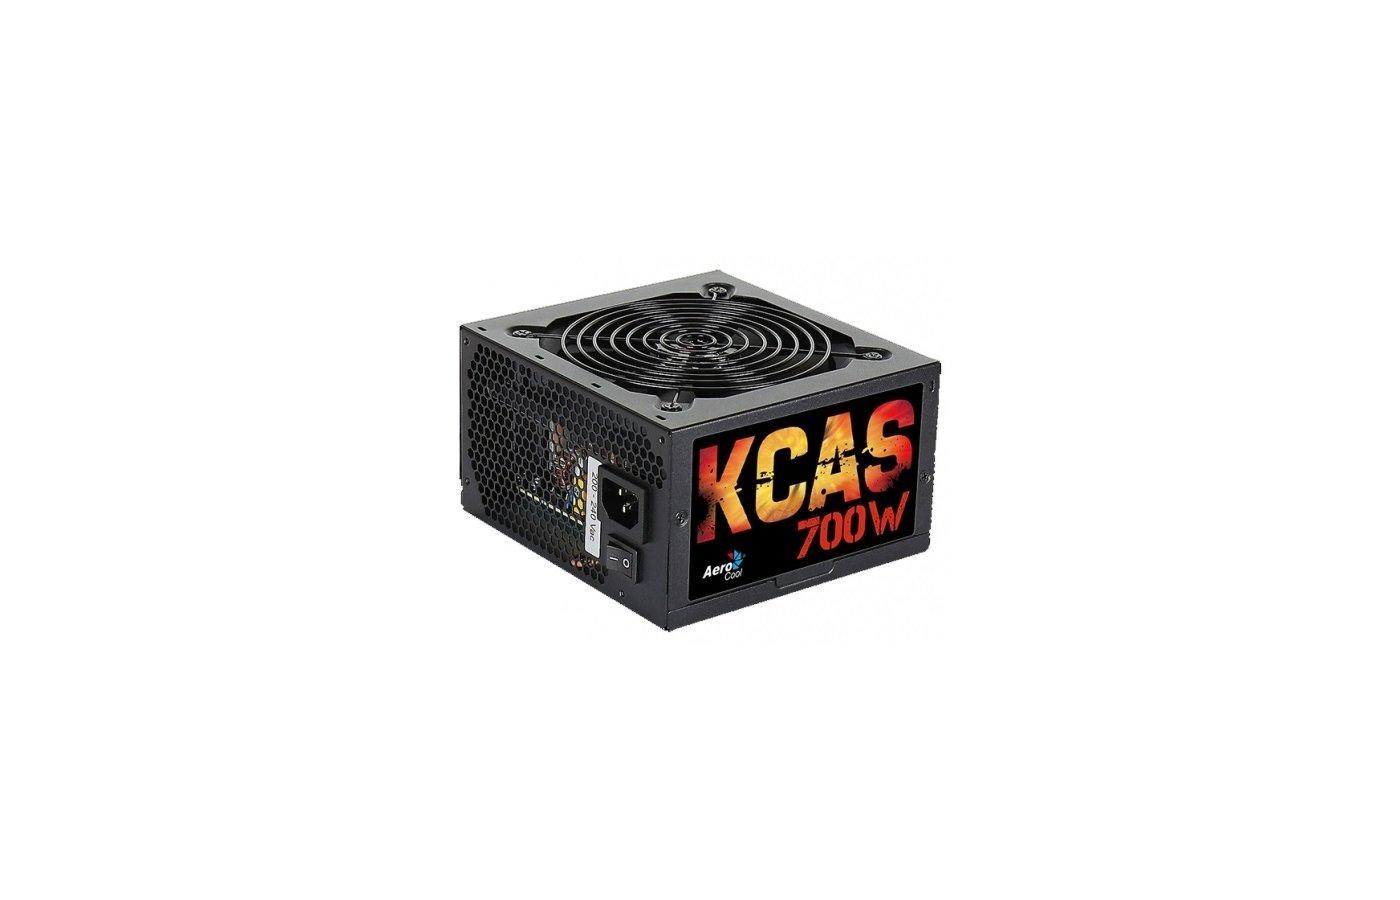 Блок питания Aerocool ATX 700W KCAS-700W 80+ bronze (24+4+4pin) APFC 120mm fan 7xSATA RTL